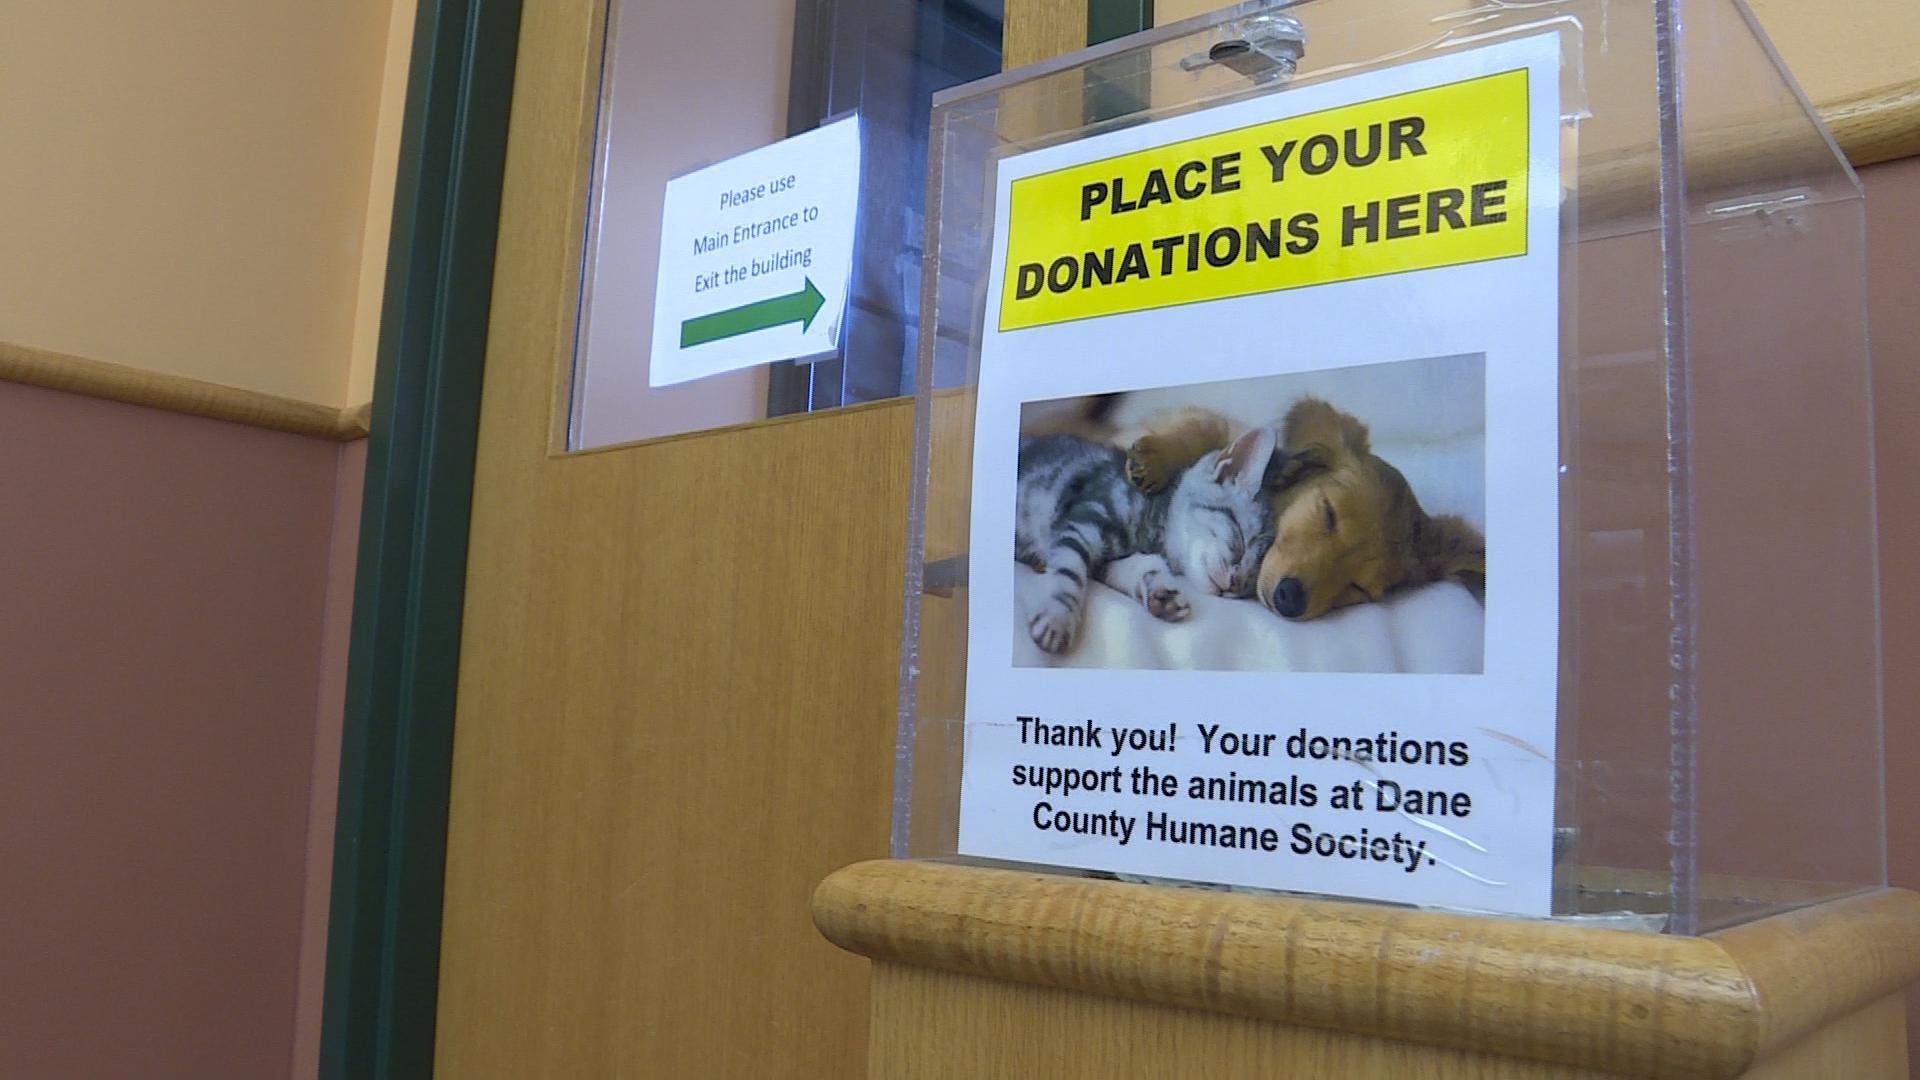 Donation box at the Dane County Humane Society